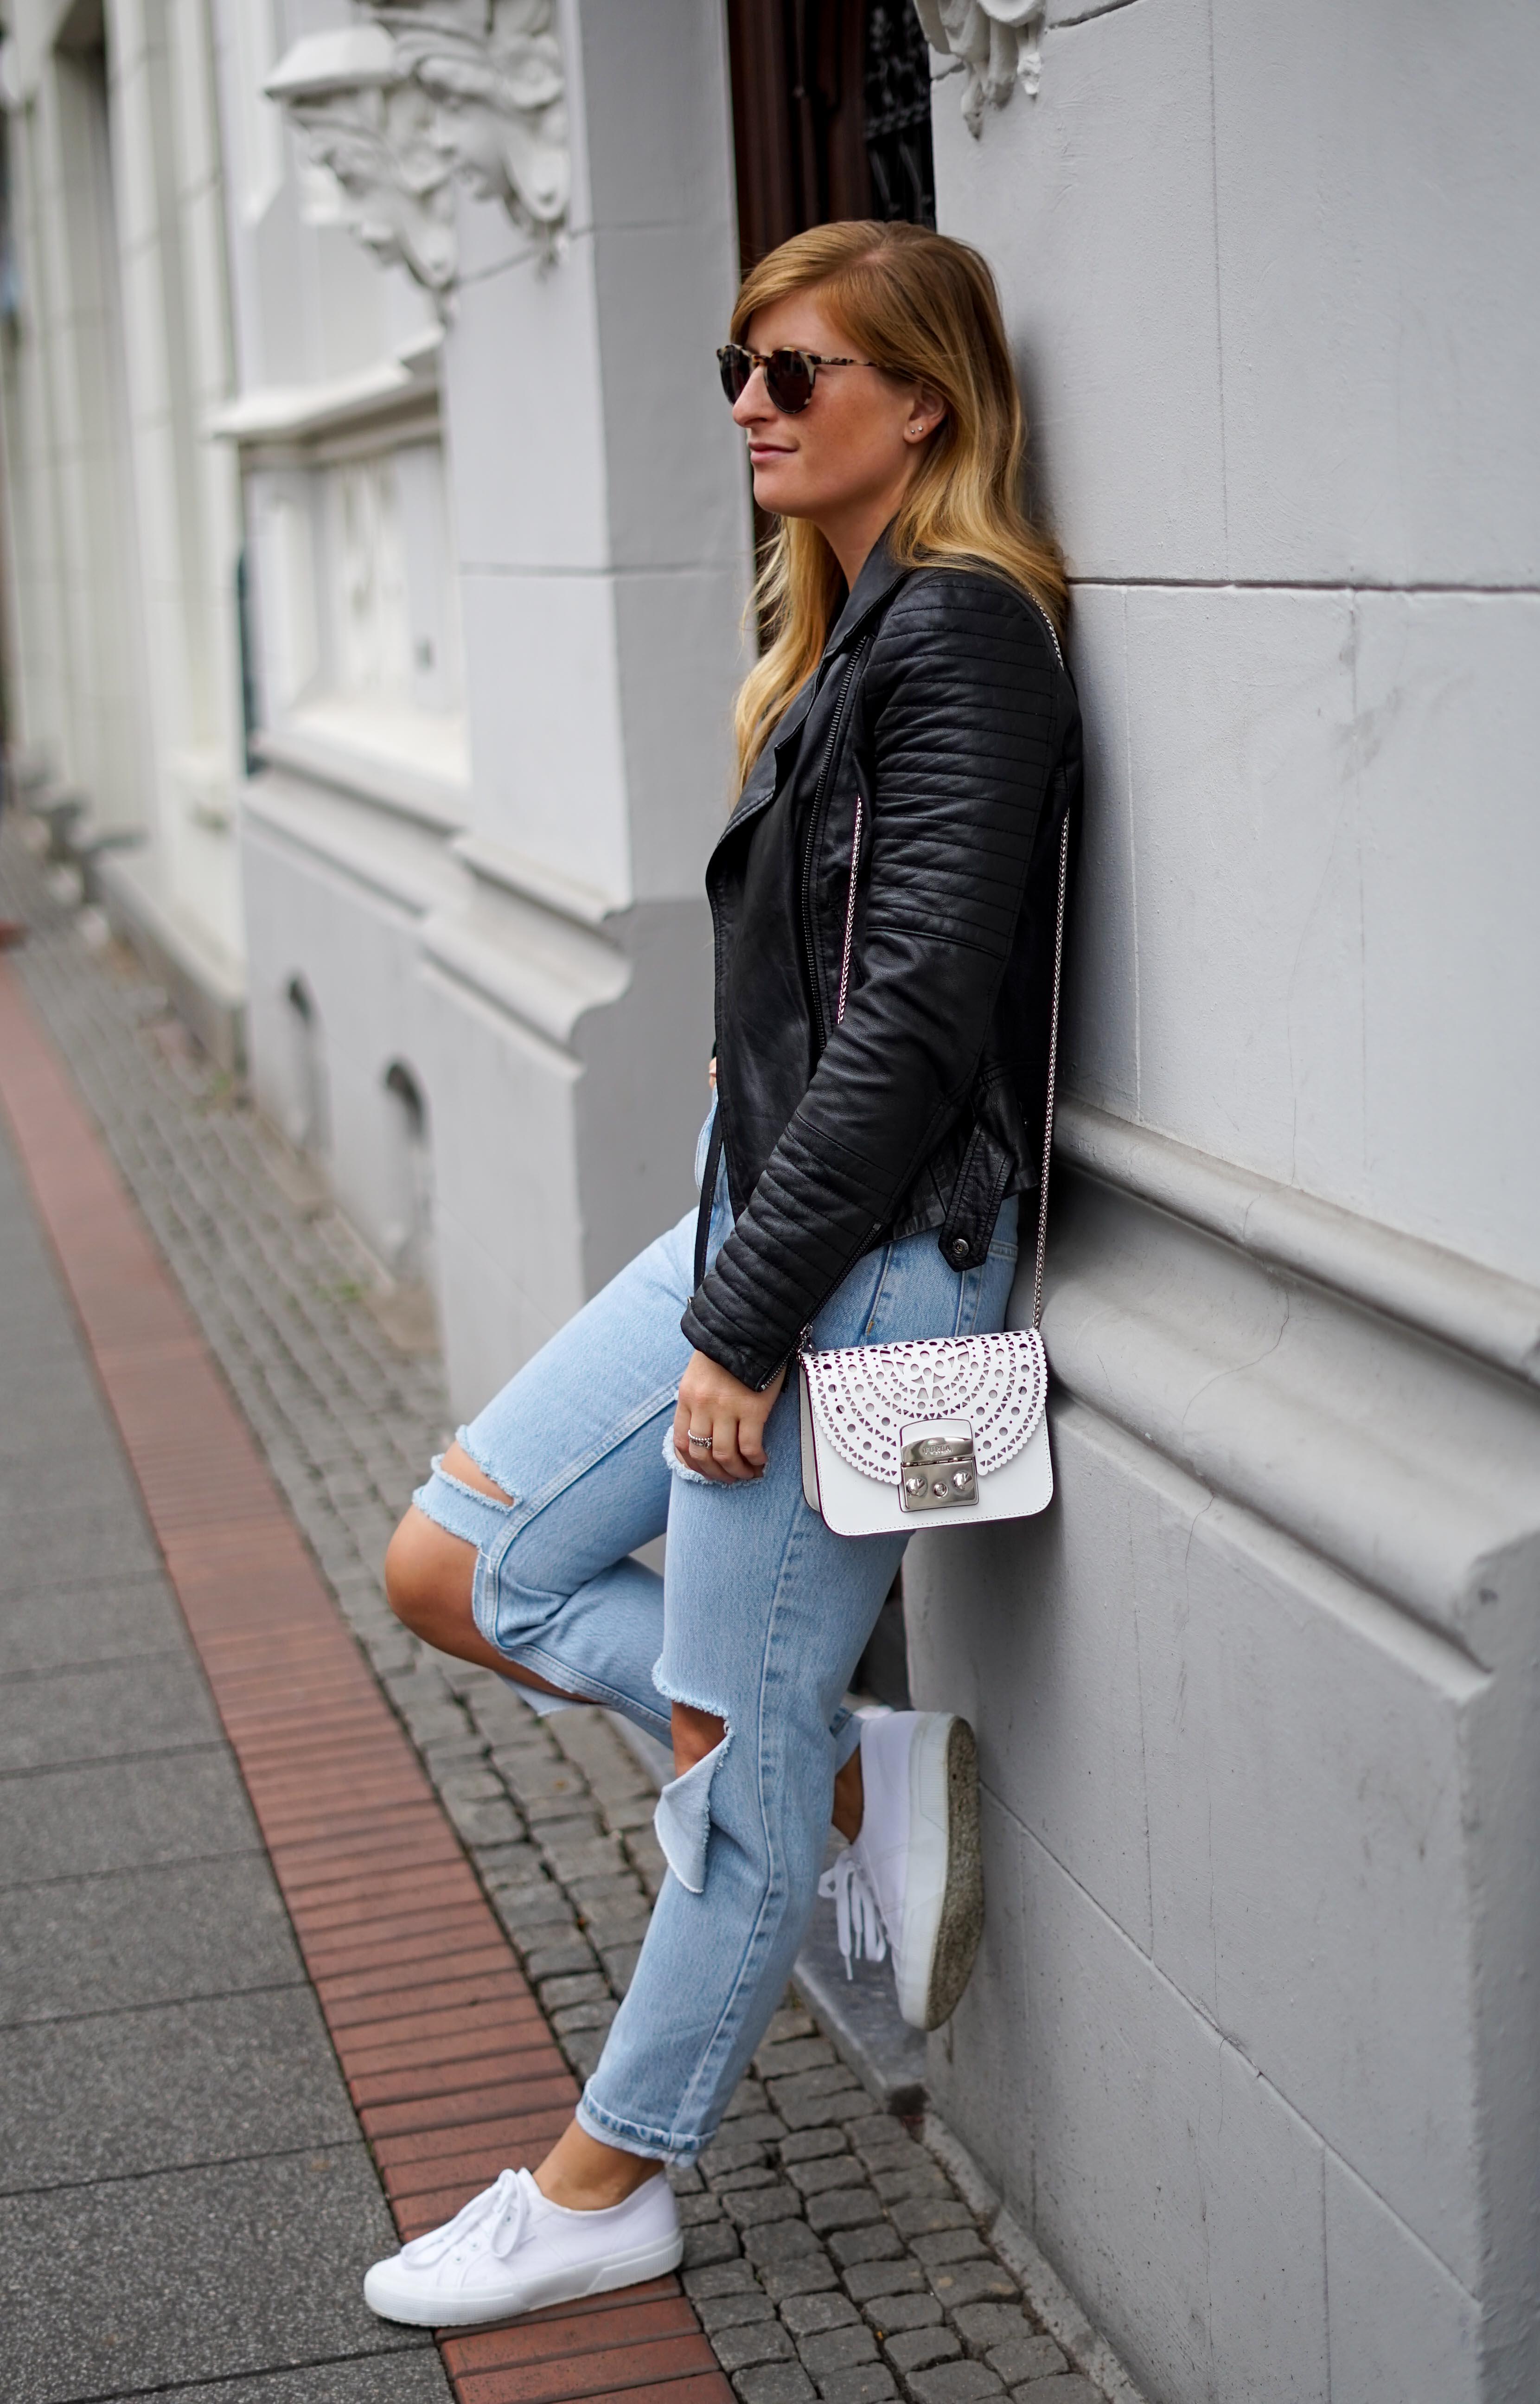 Herbstmode 2019 Herbstoutfit Lederjacke Ripped Jeans Modeblog Bonn 92